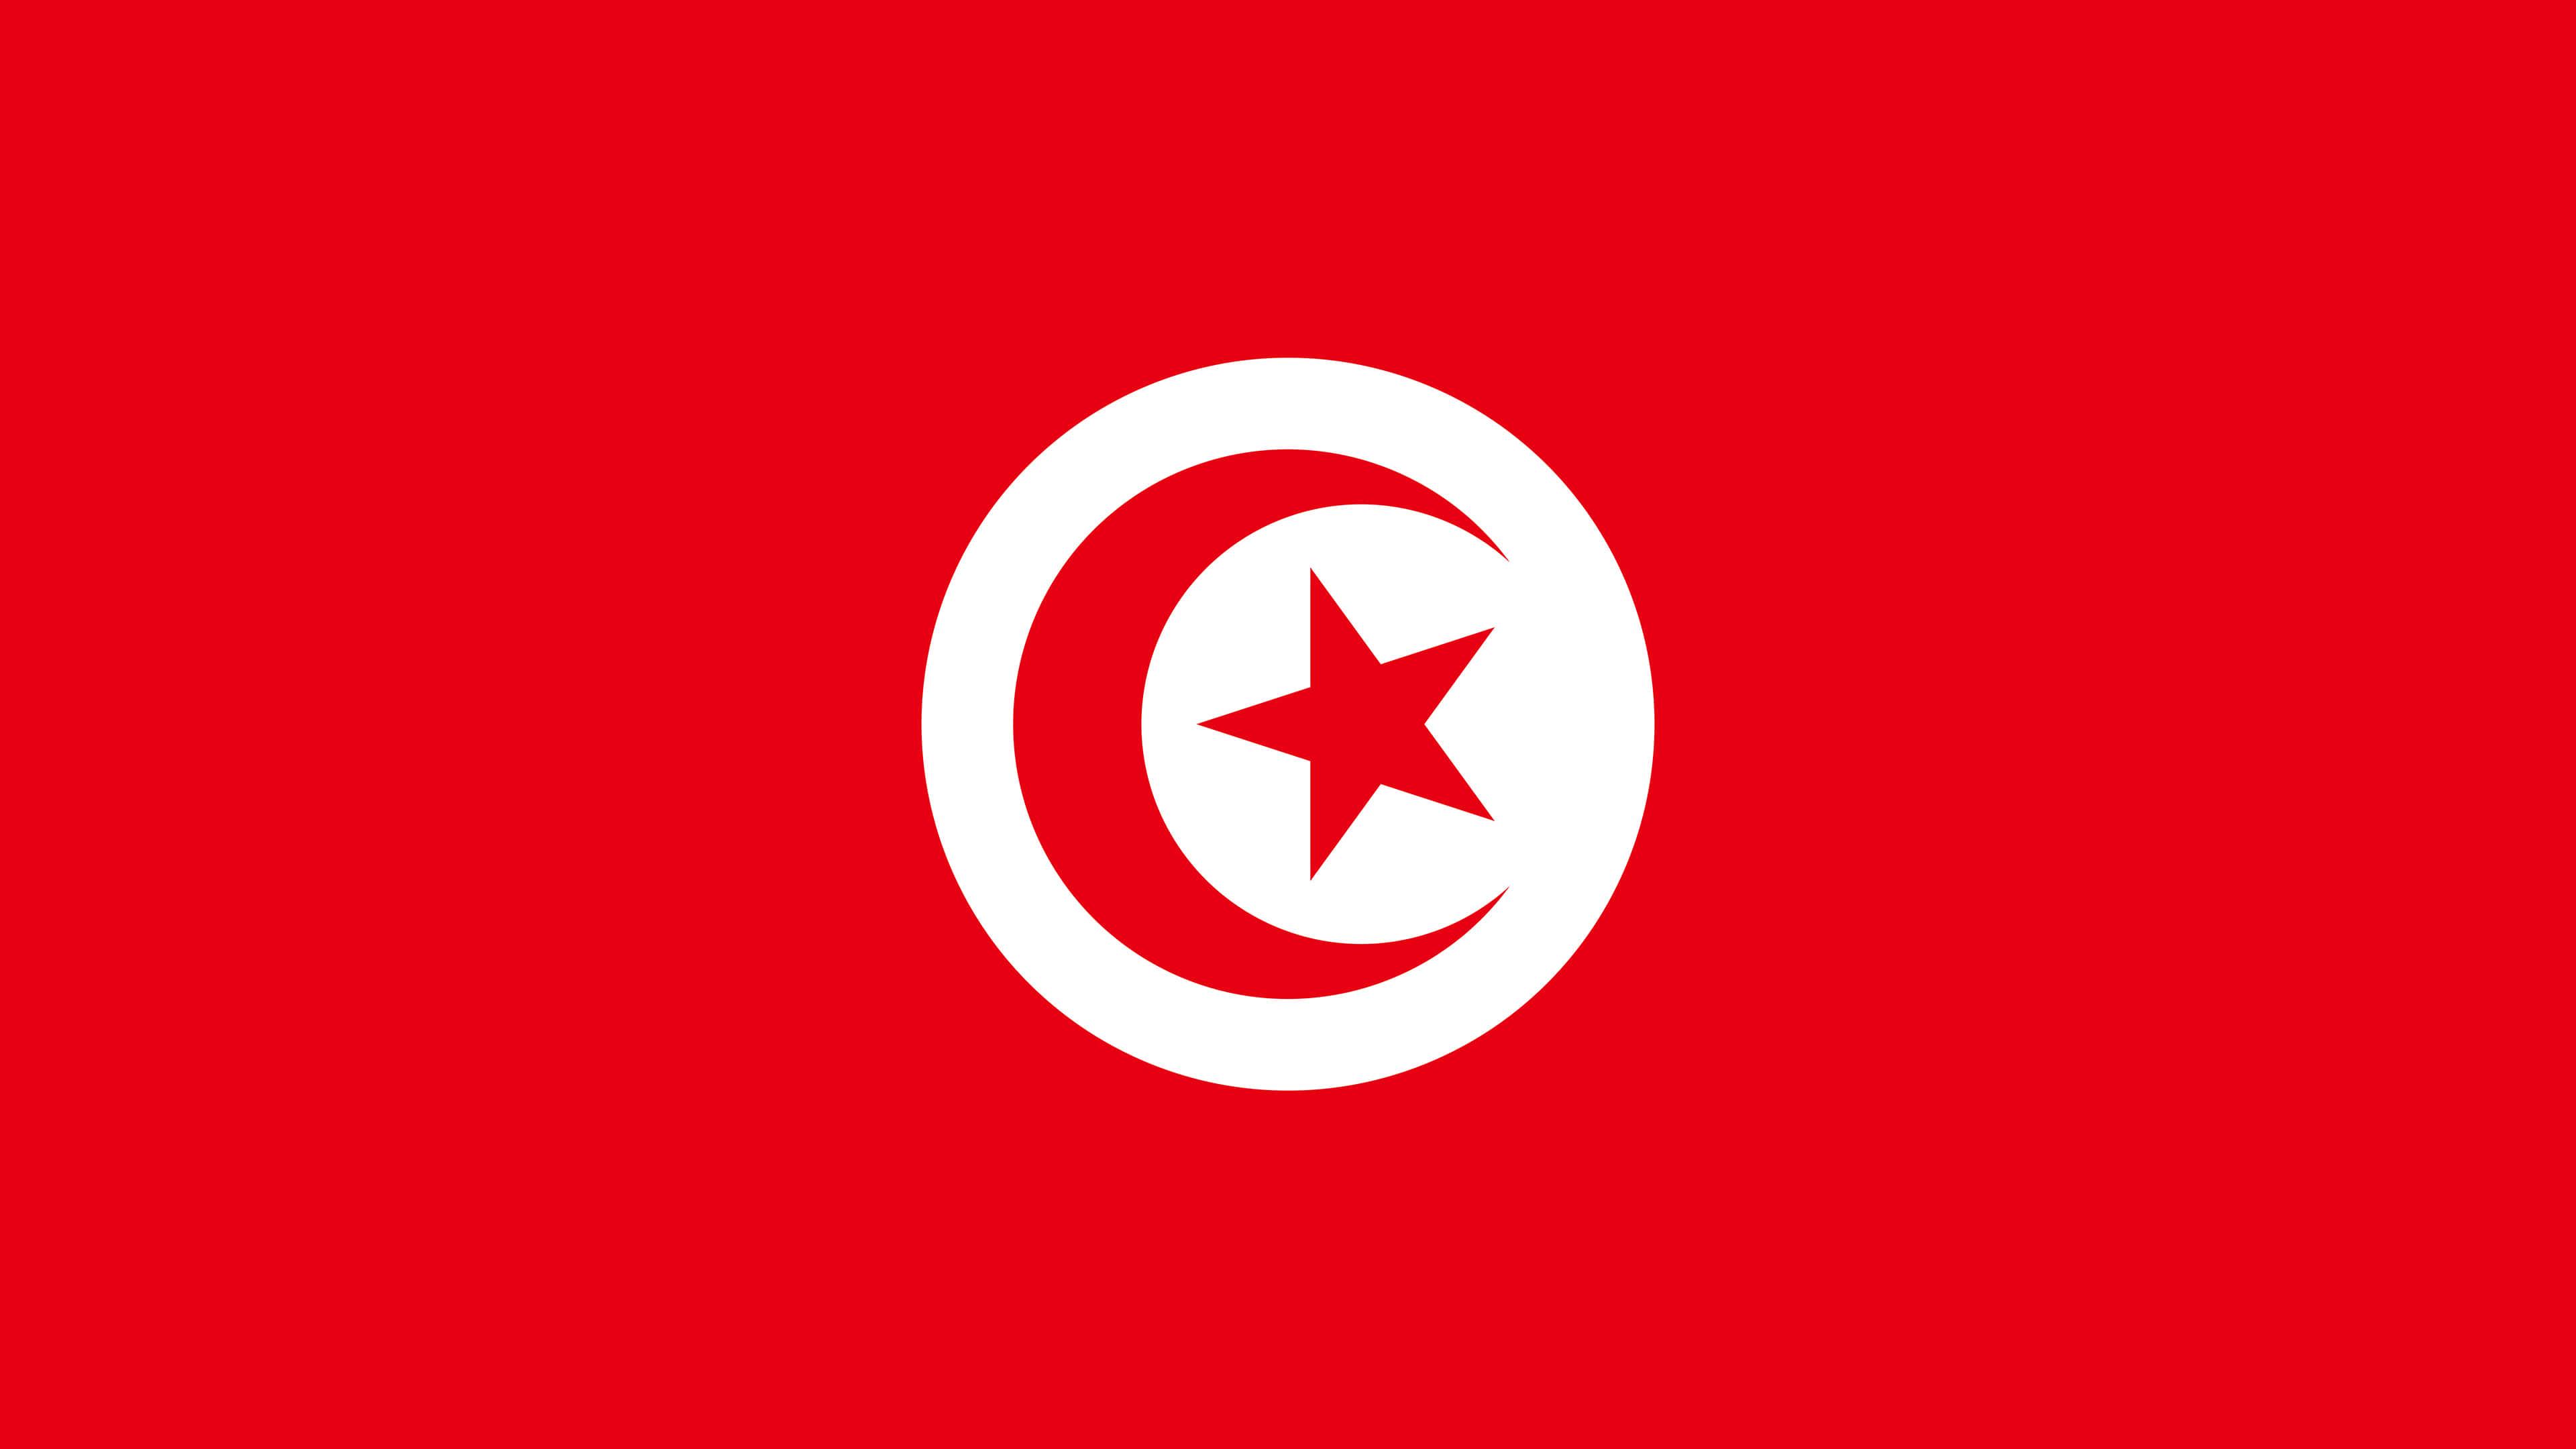 Tunisia Flag UHD 4K Wallpaper Pixelz 3840x2160